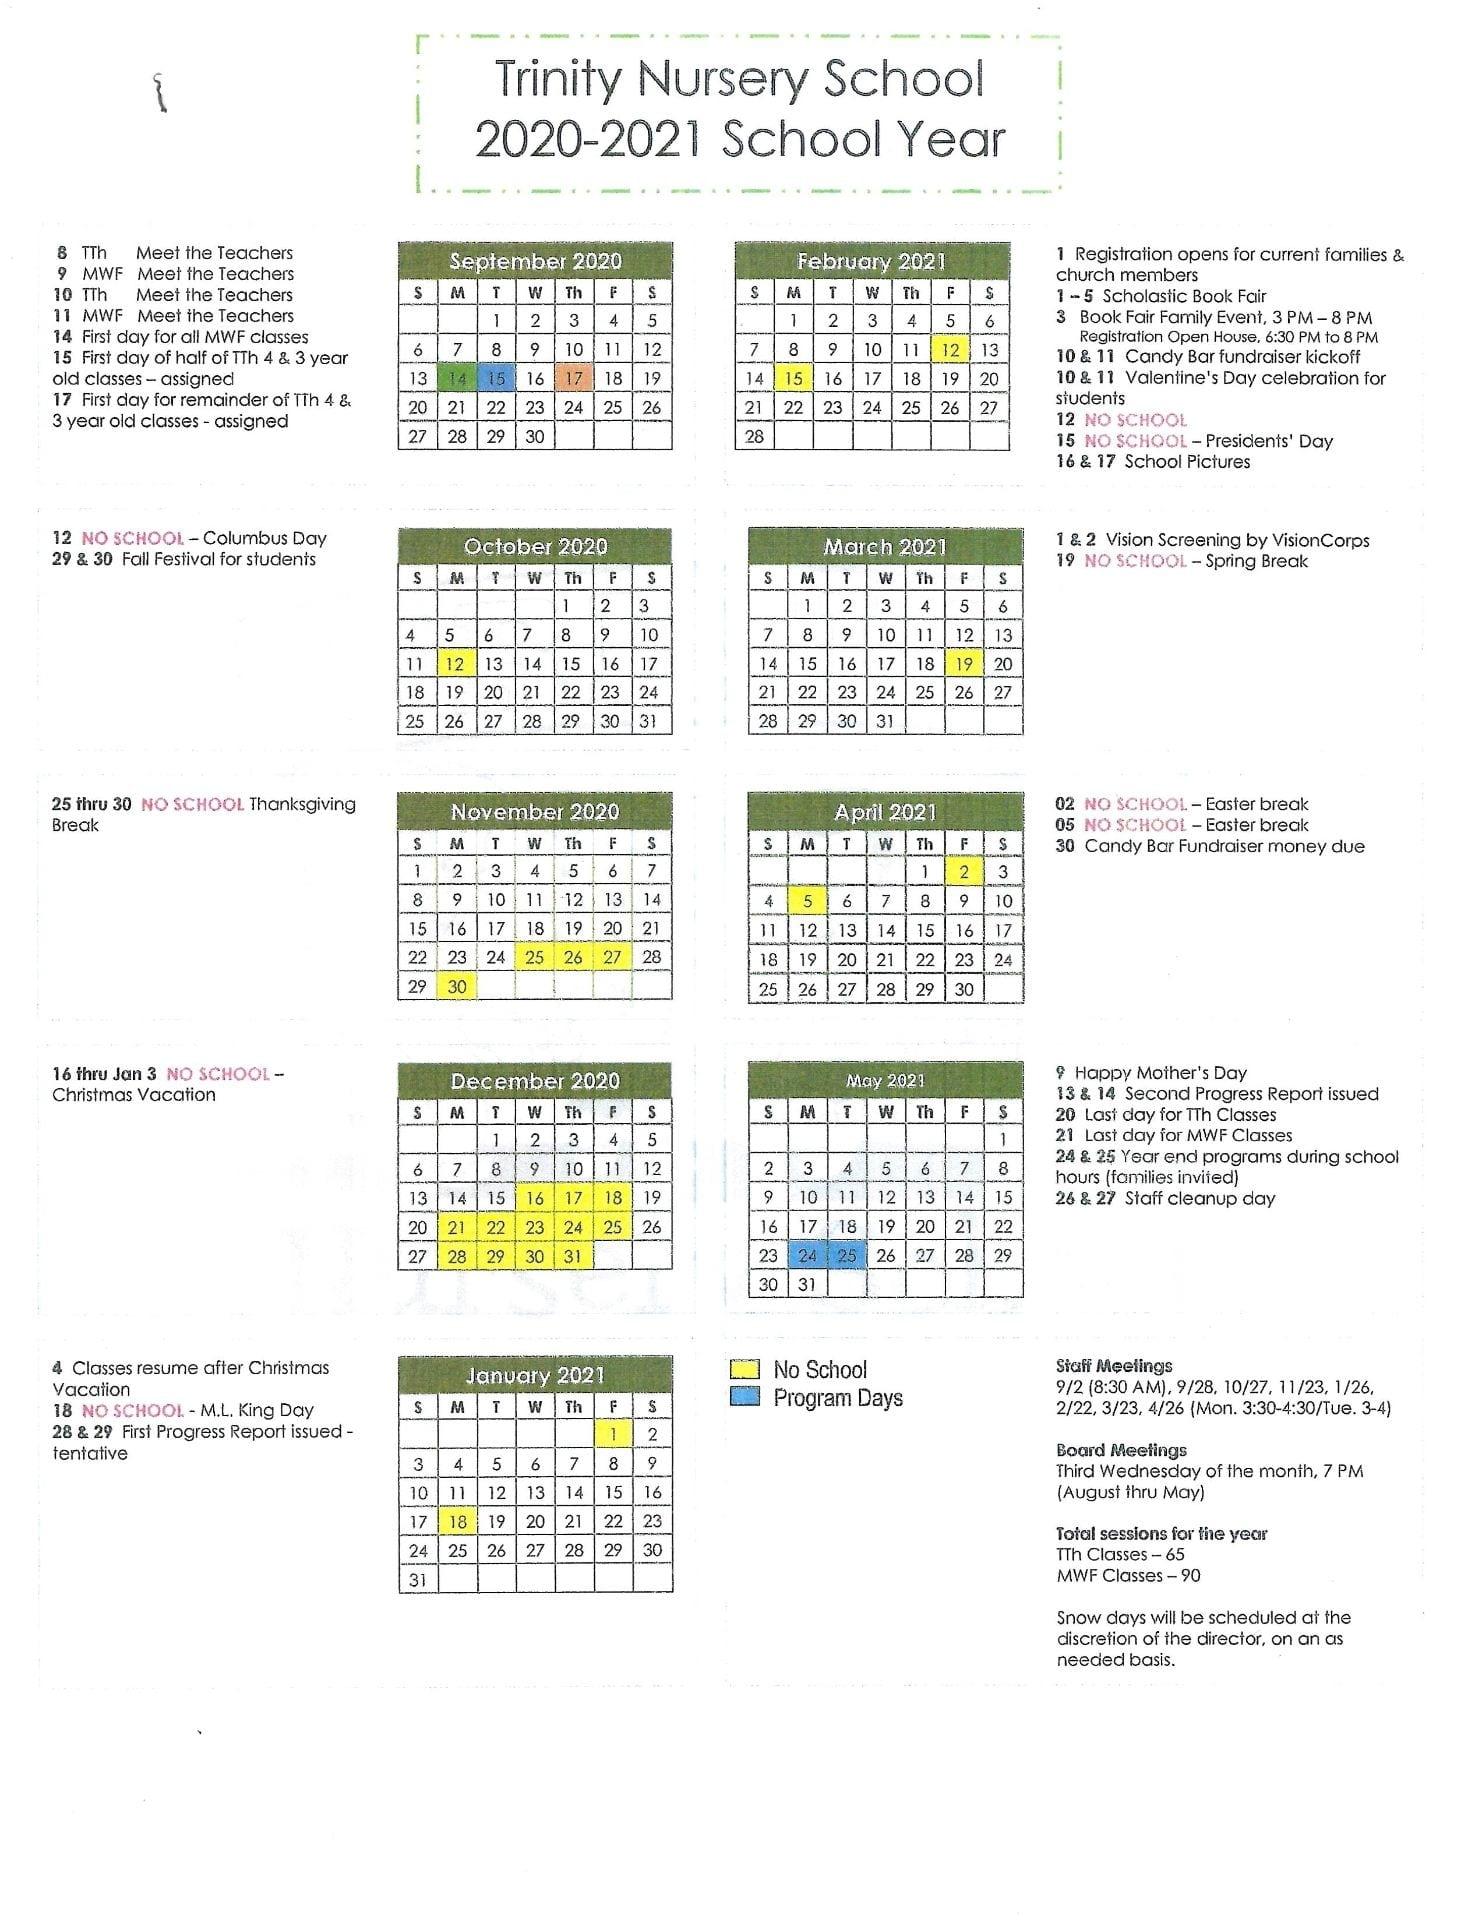 2020 -2021 School Year Calendar | Trinity Nursery News